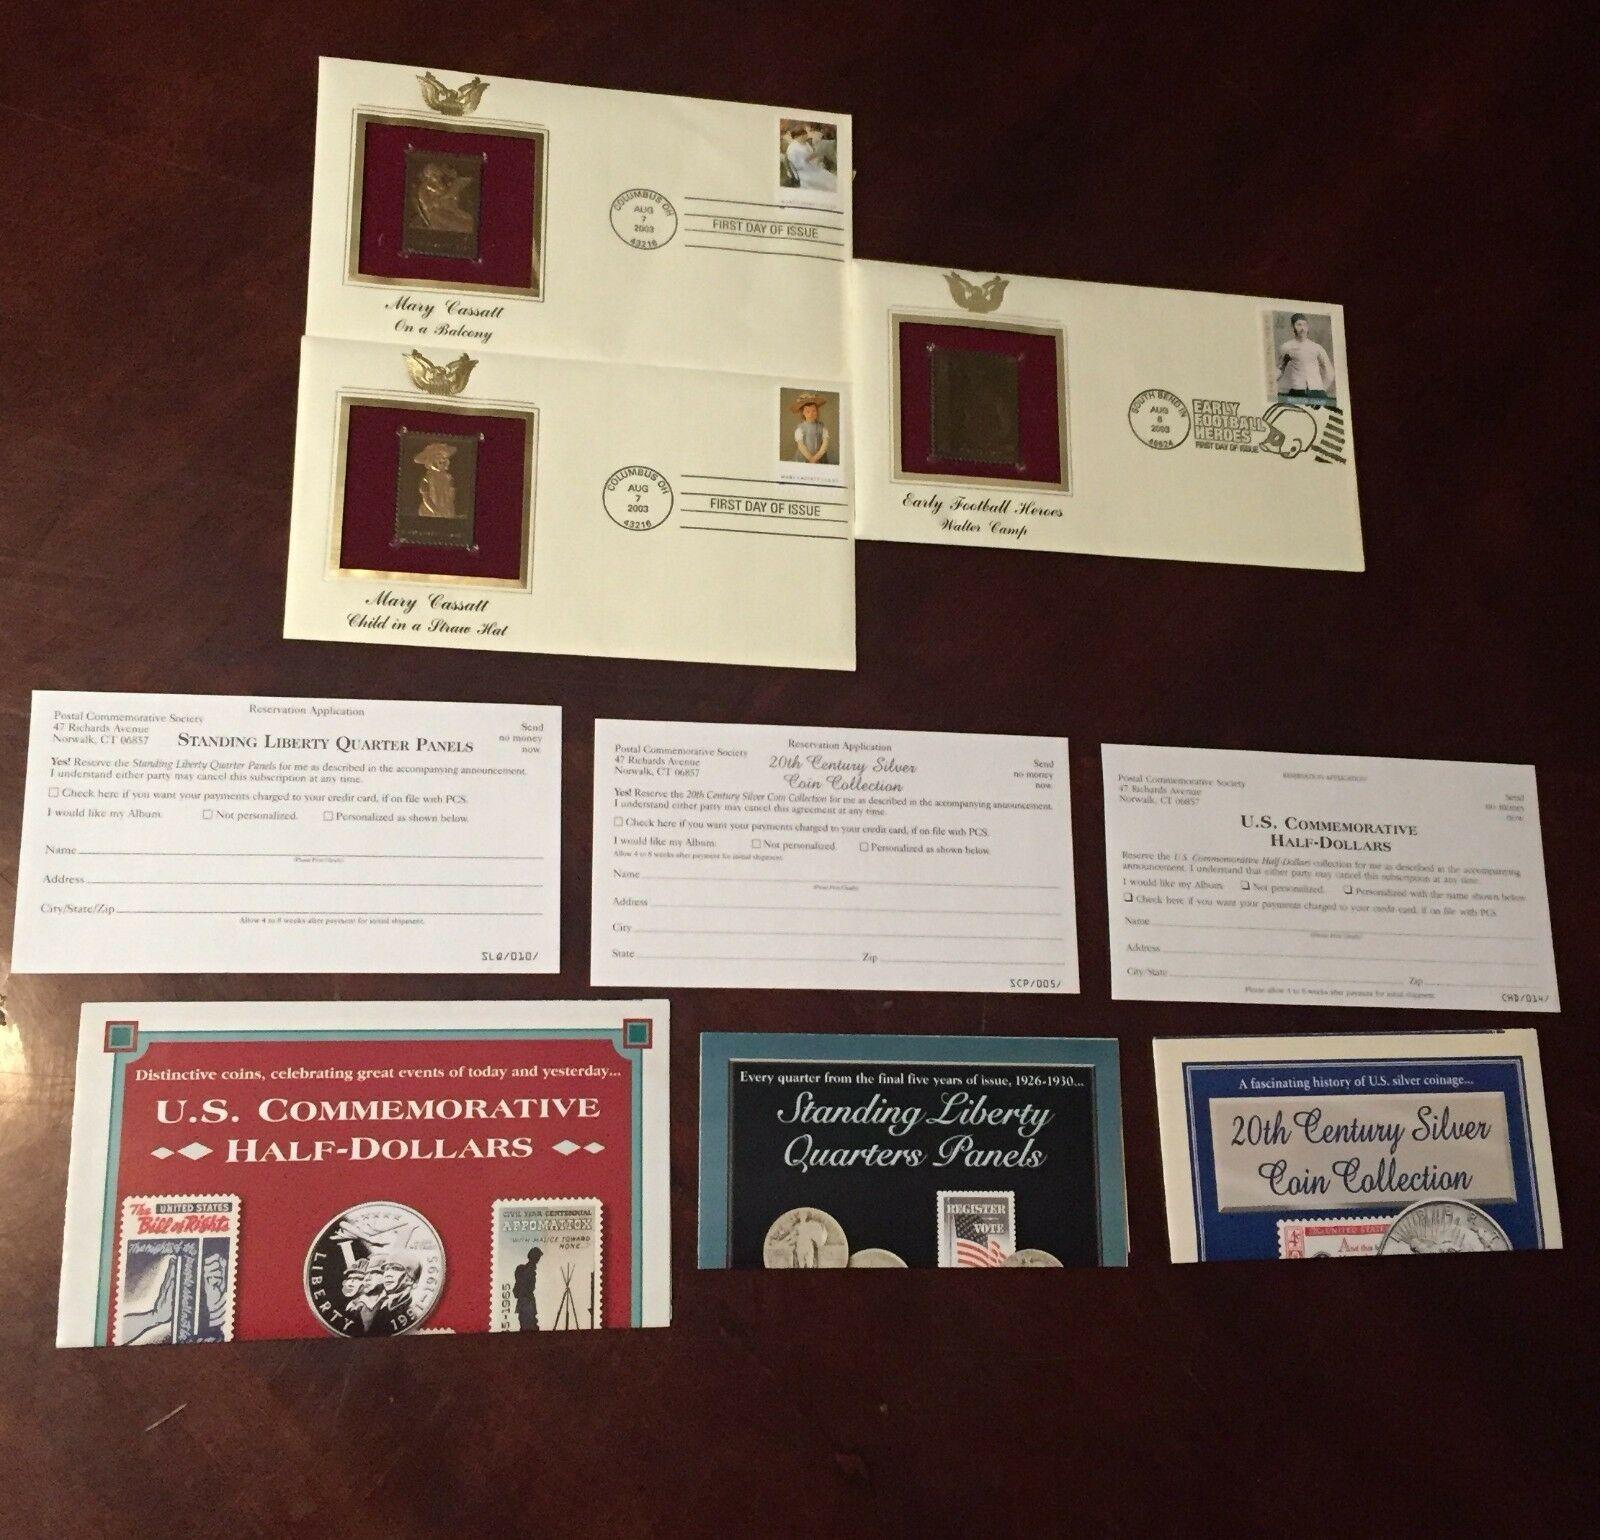 Lot of 3 GOLDEN 22K Gold Stamp Replica 1 Walter camp ~ 2 Mary Cassatt (Balcony/S